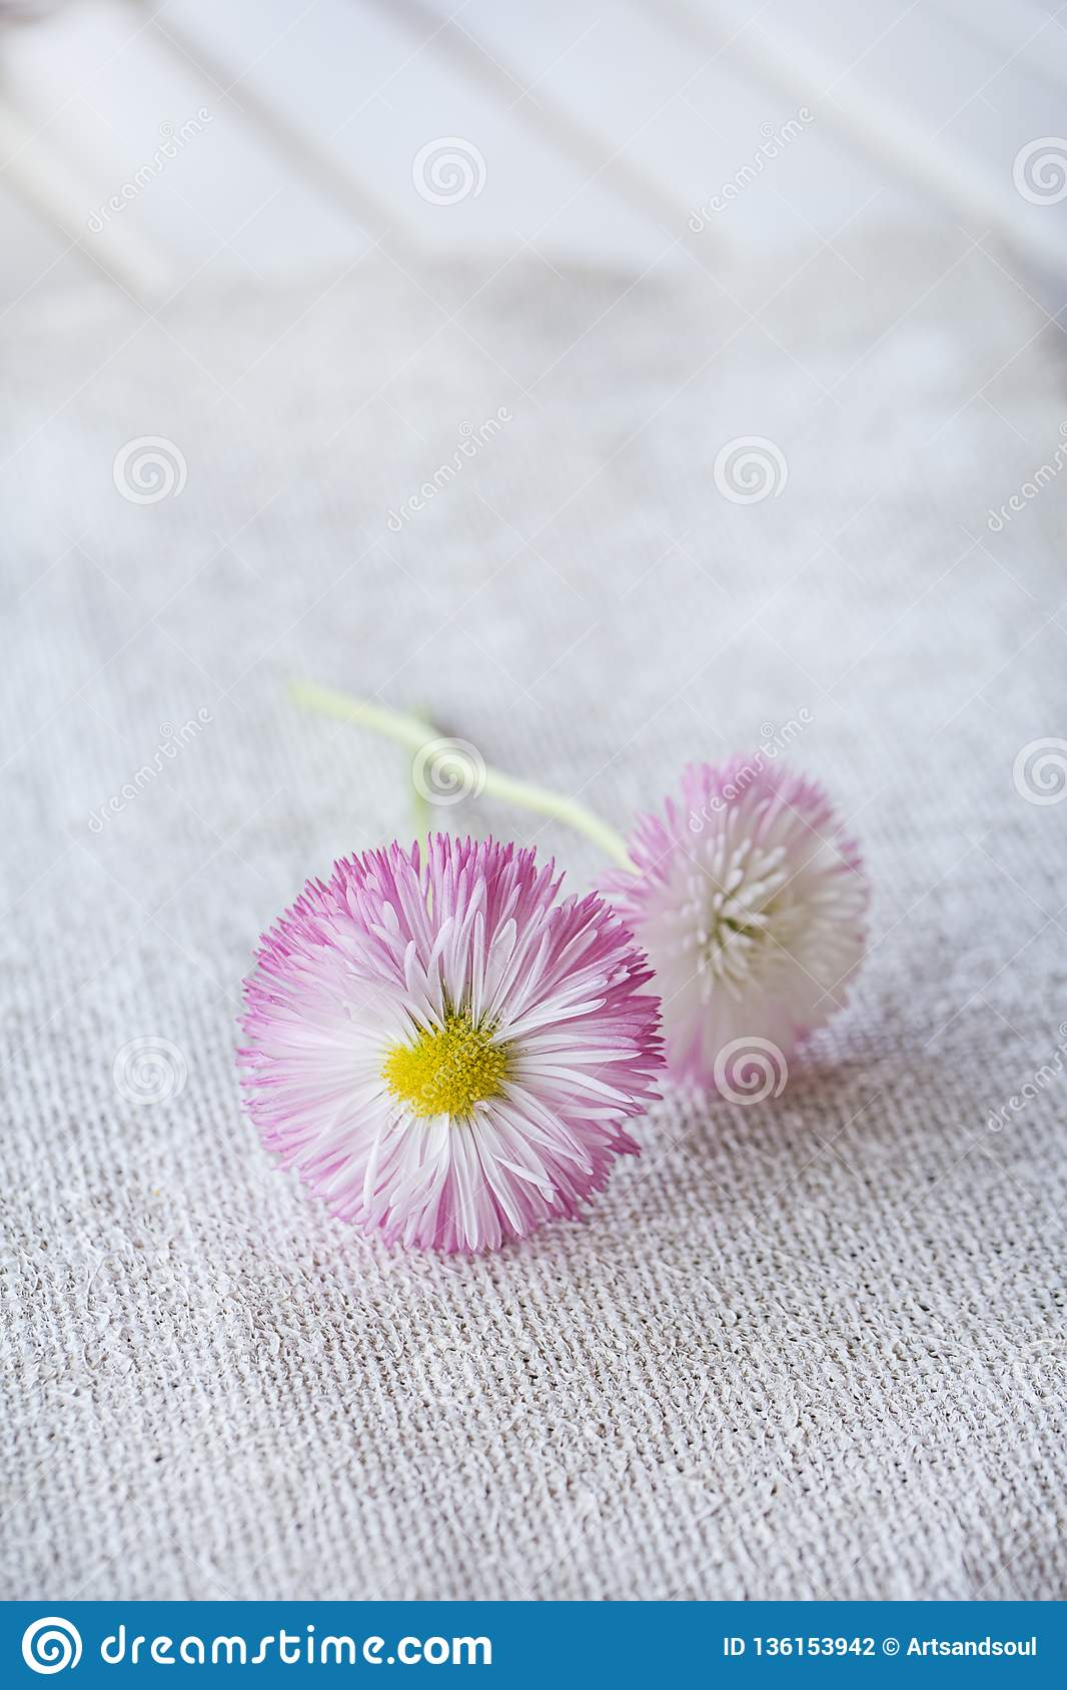 Daisy Flowers On Burlap delicata